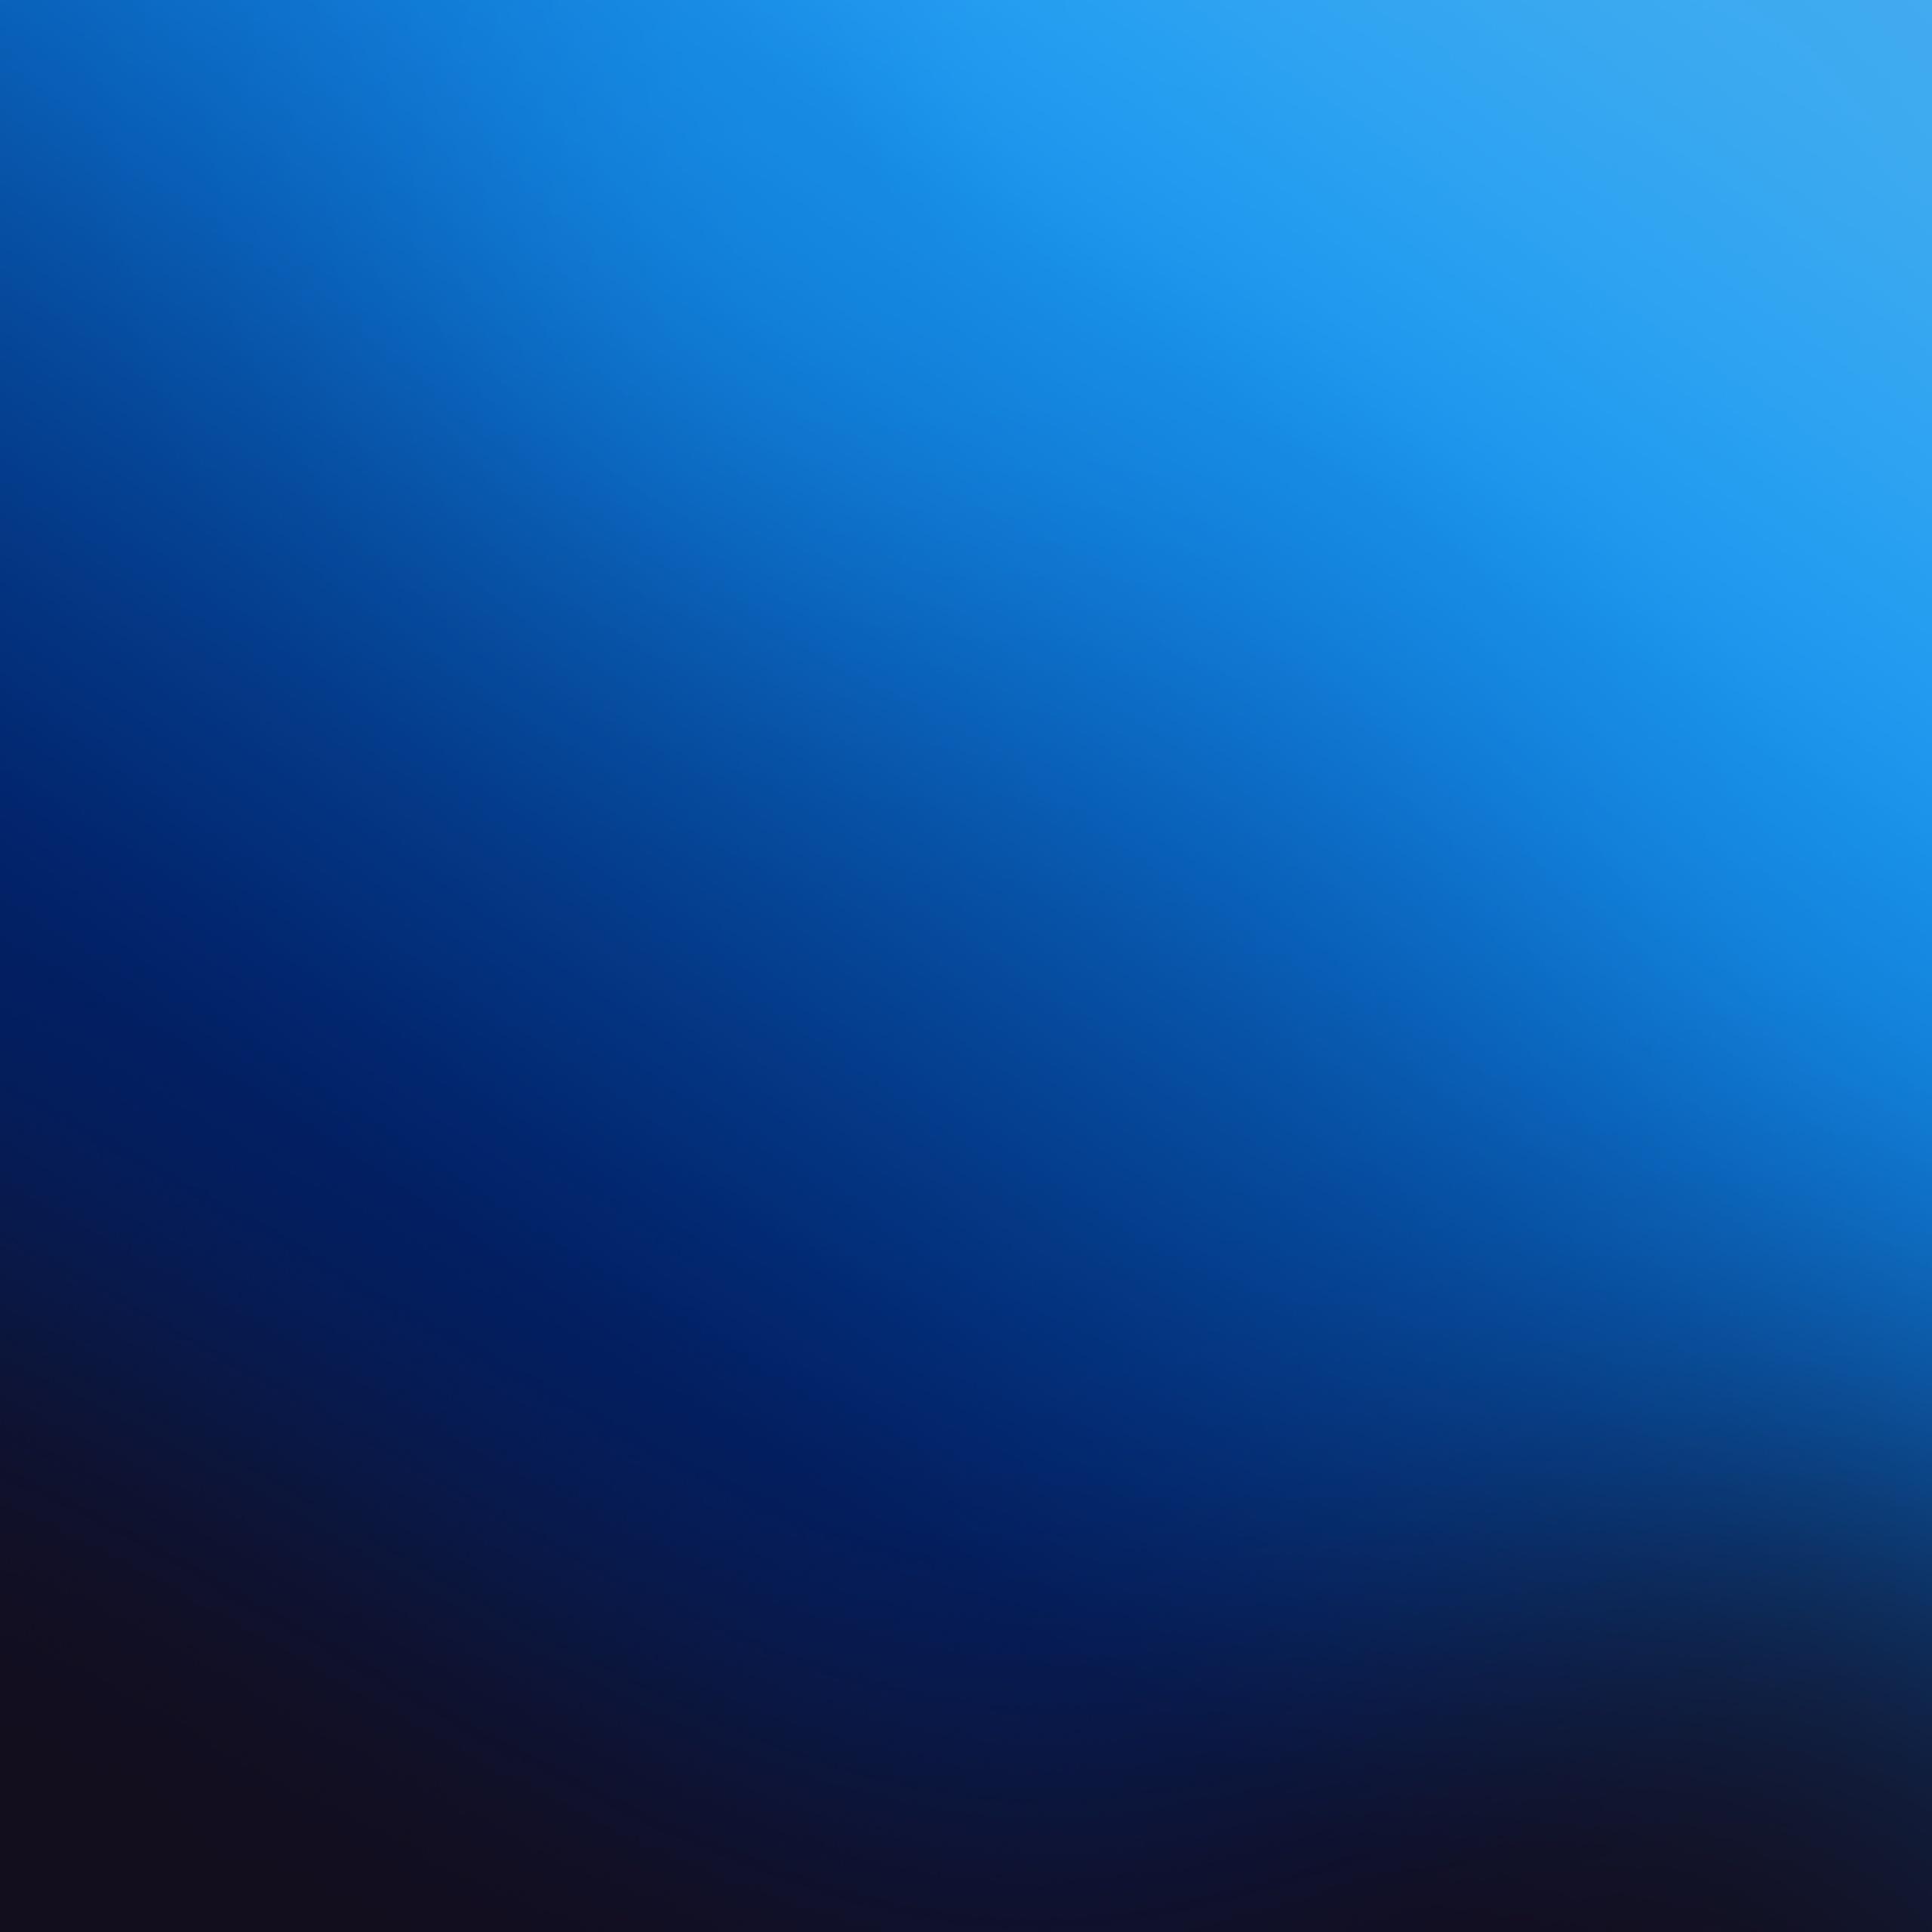 Download Samsung Galaxy J7 Max Wallpapers Droidviews